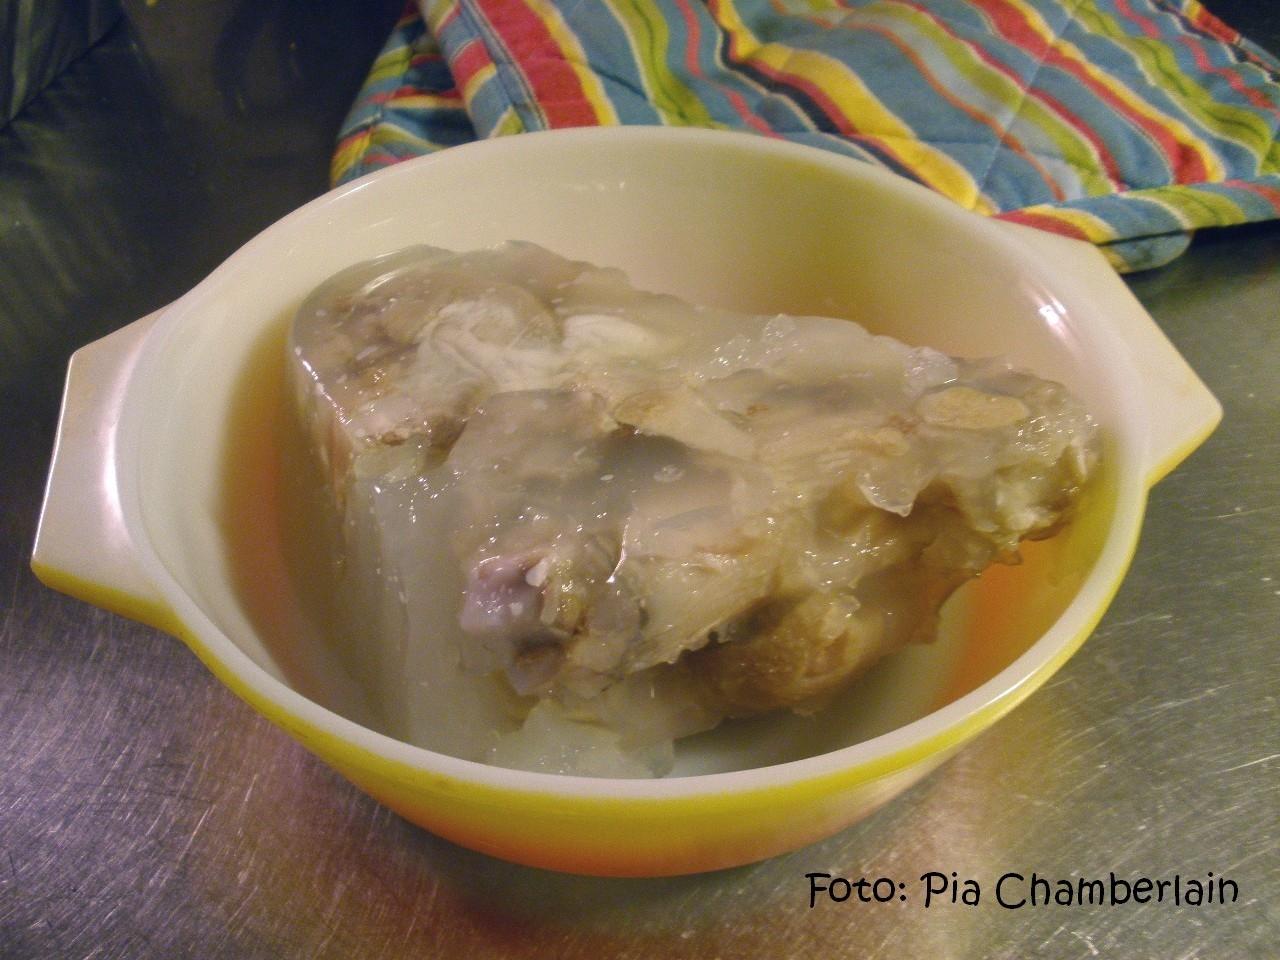 kokta grisfötter i gele